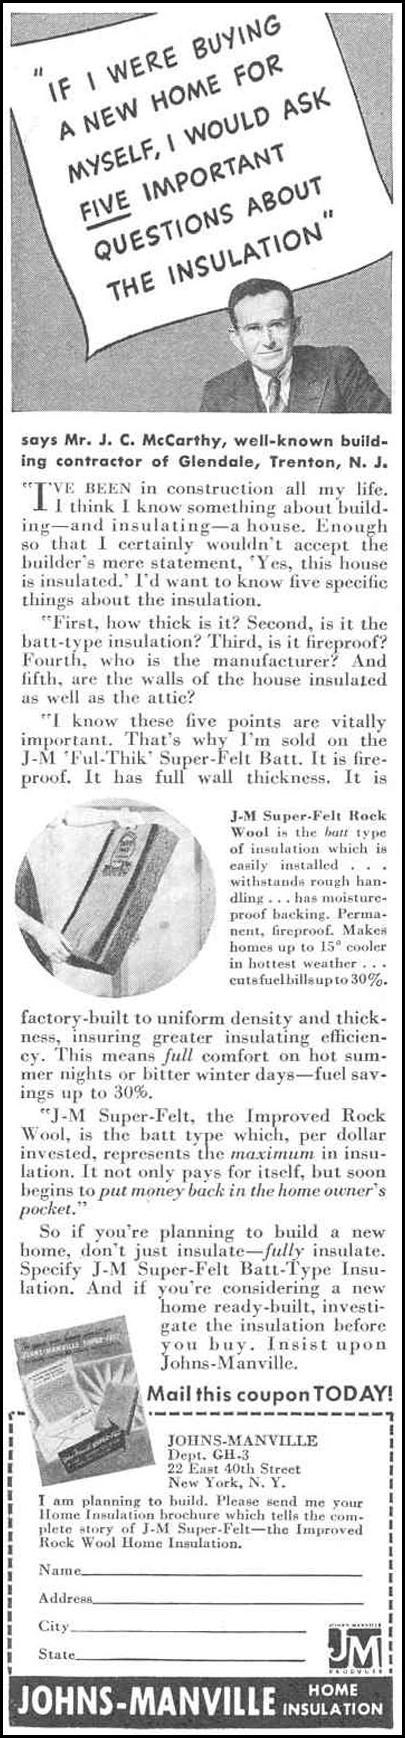 HOME INSULATION GOOD HOUSEKEEPING 03/01/1940 p. 168